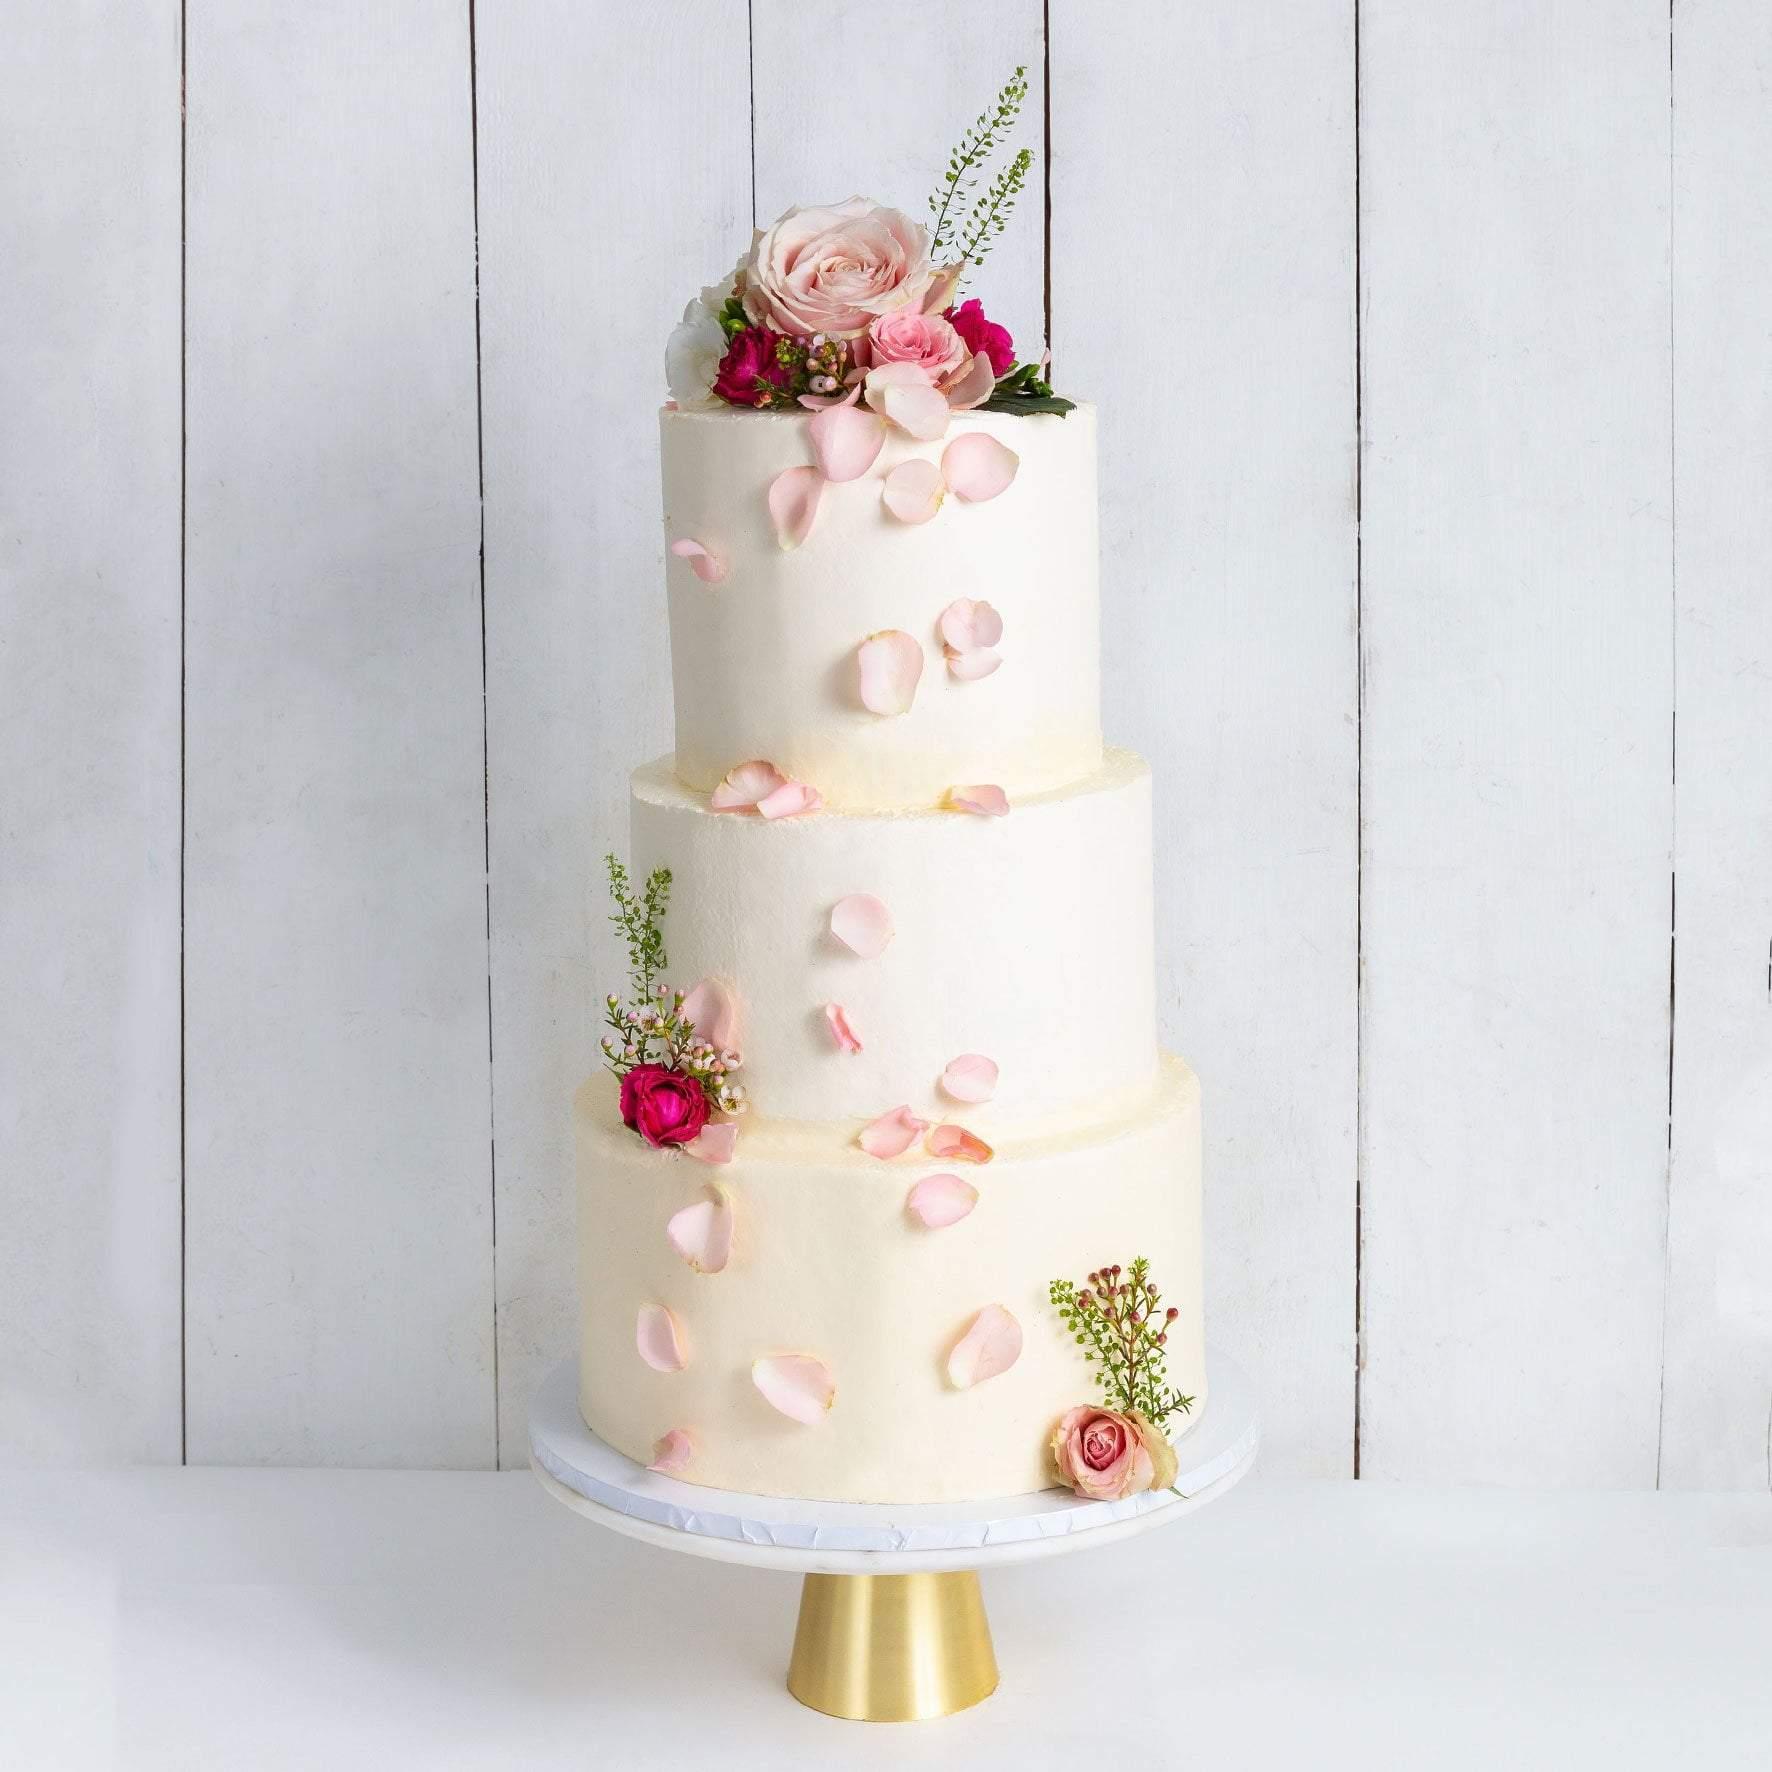 Simply White Wedding Cake